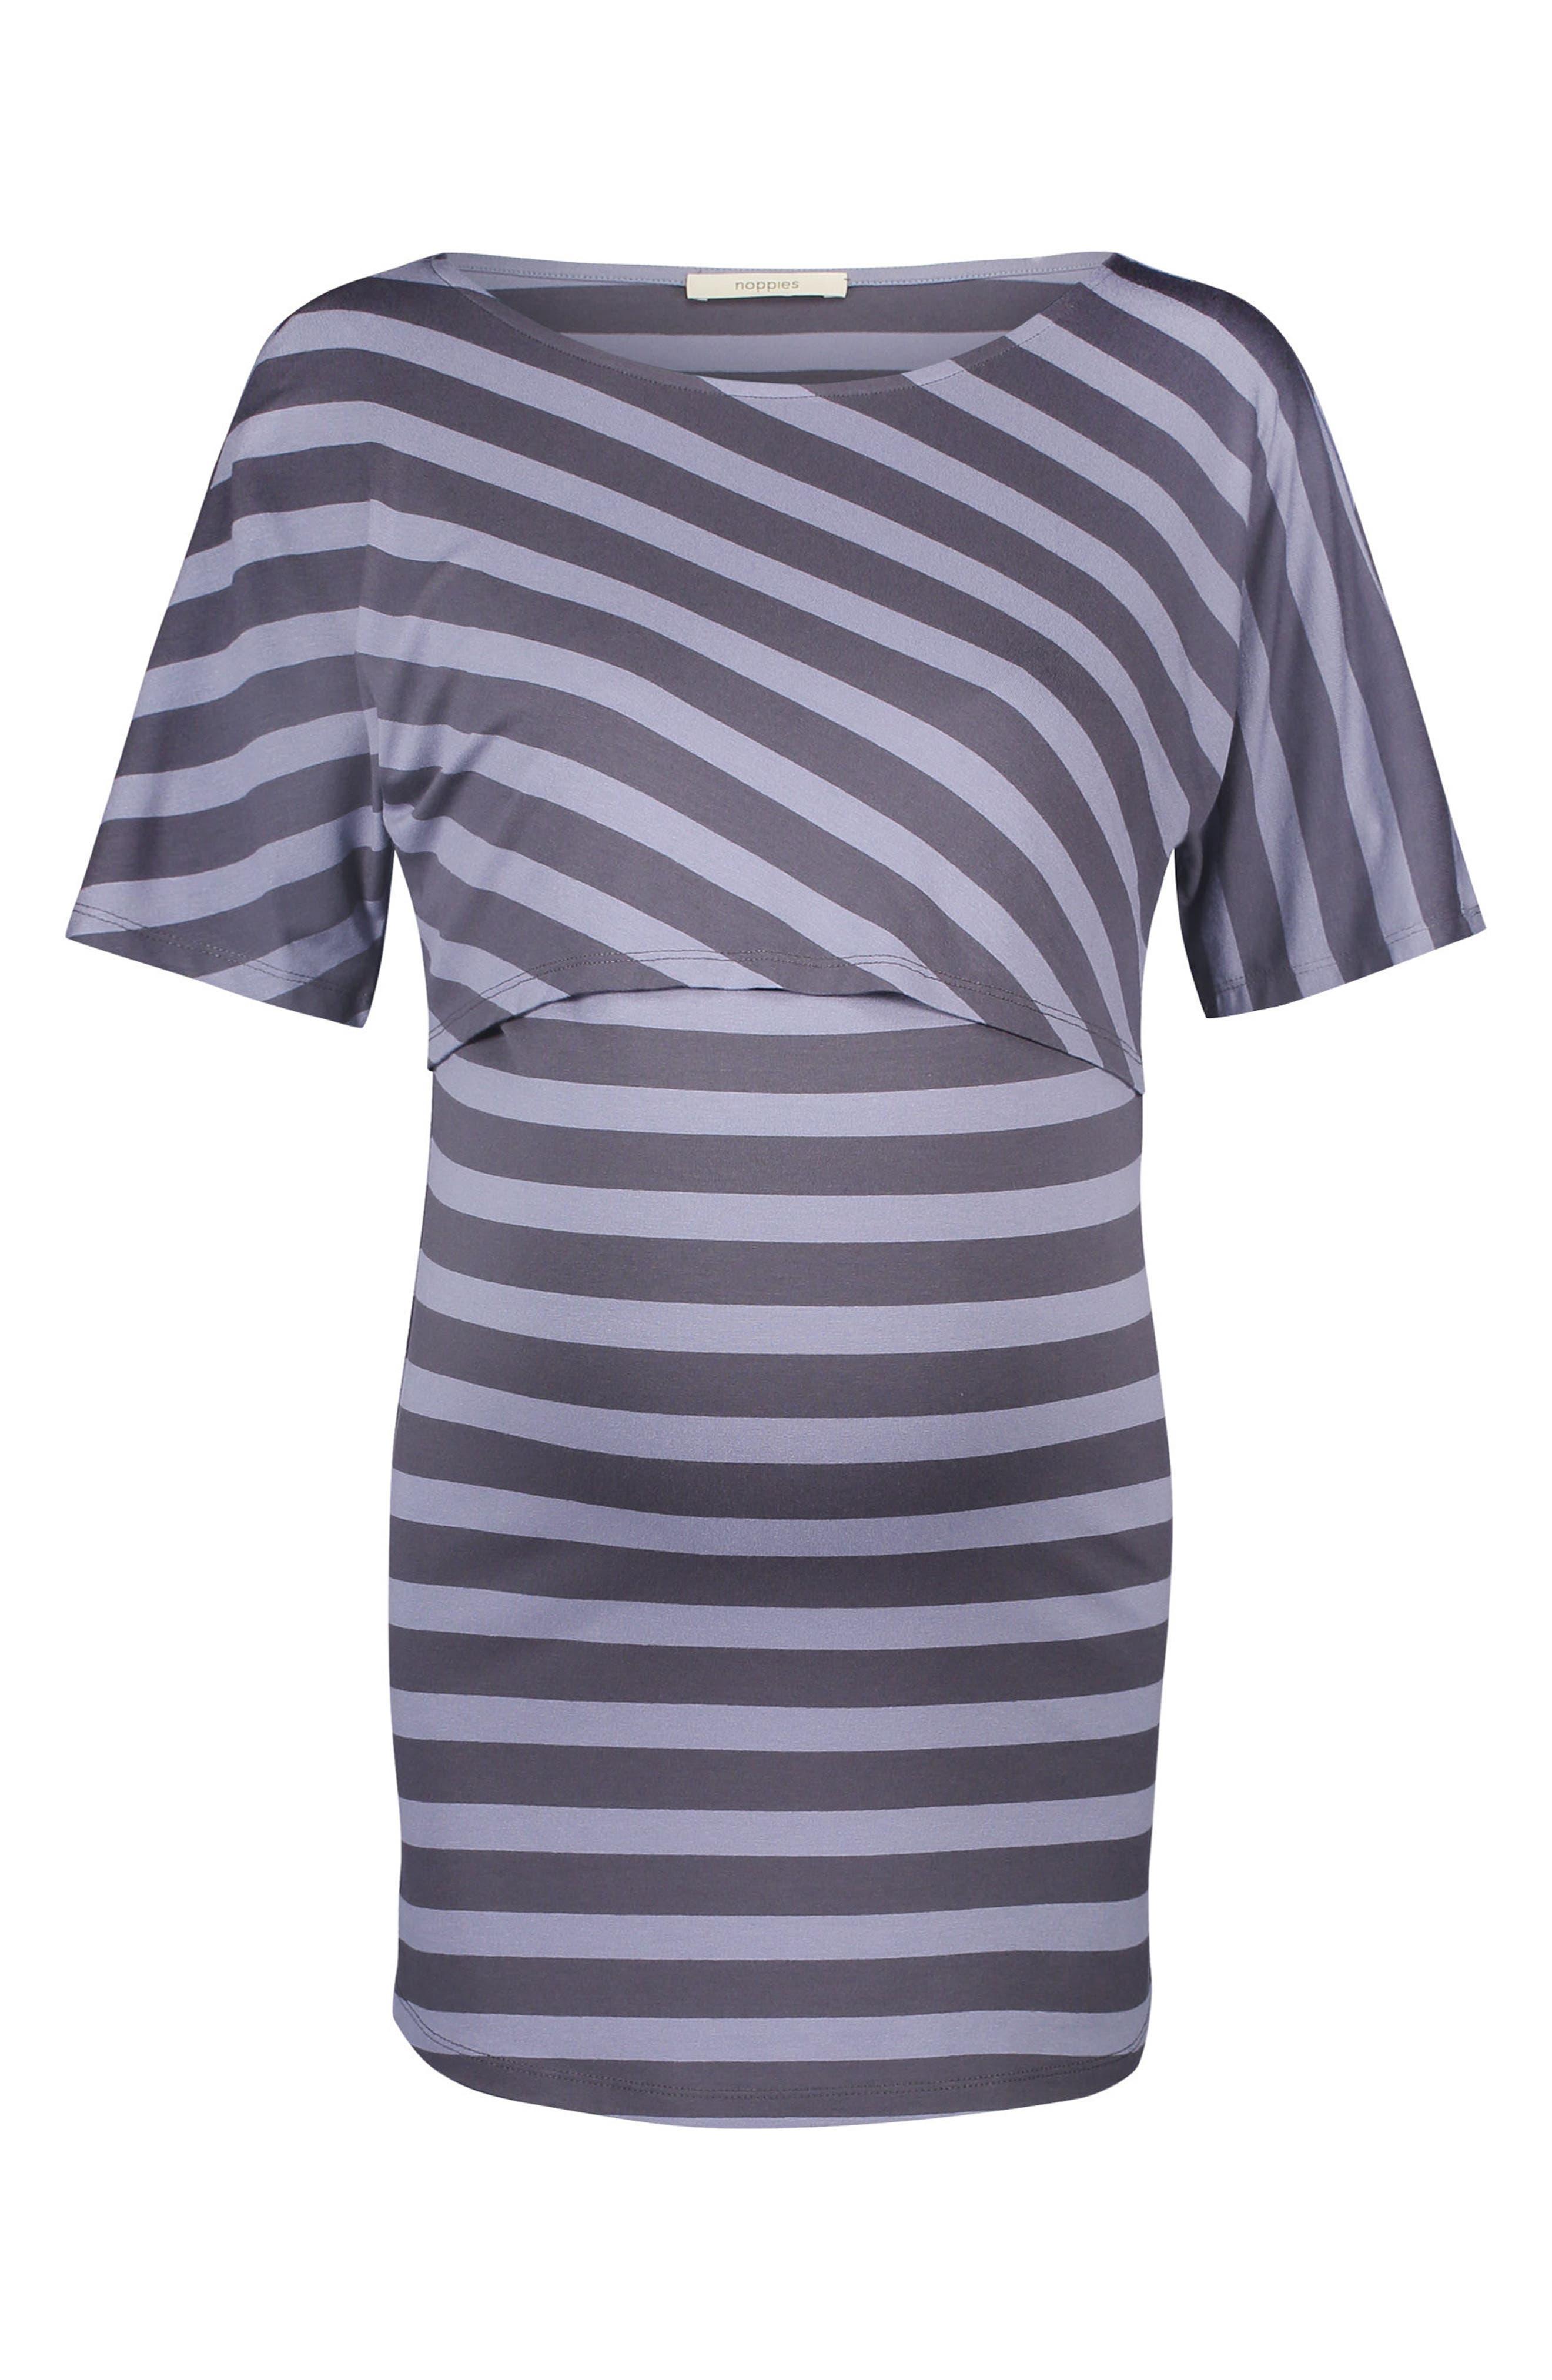 Alice Maternity/Nursing Top,                         Main,                         color, Blue Strip